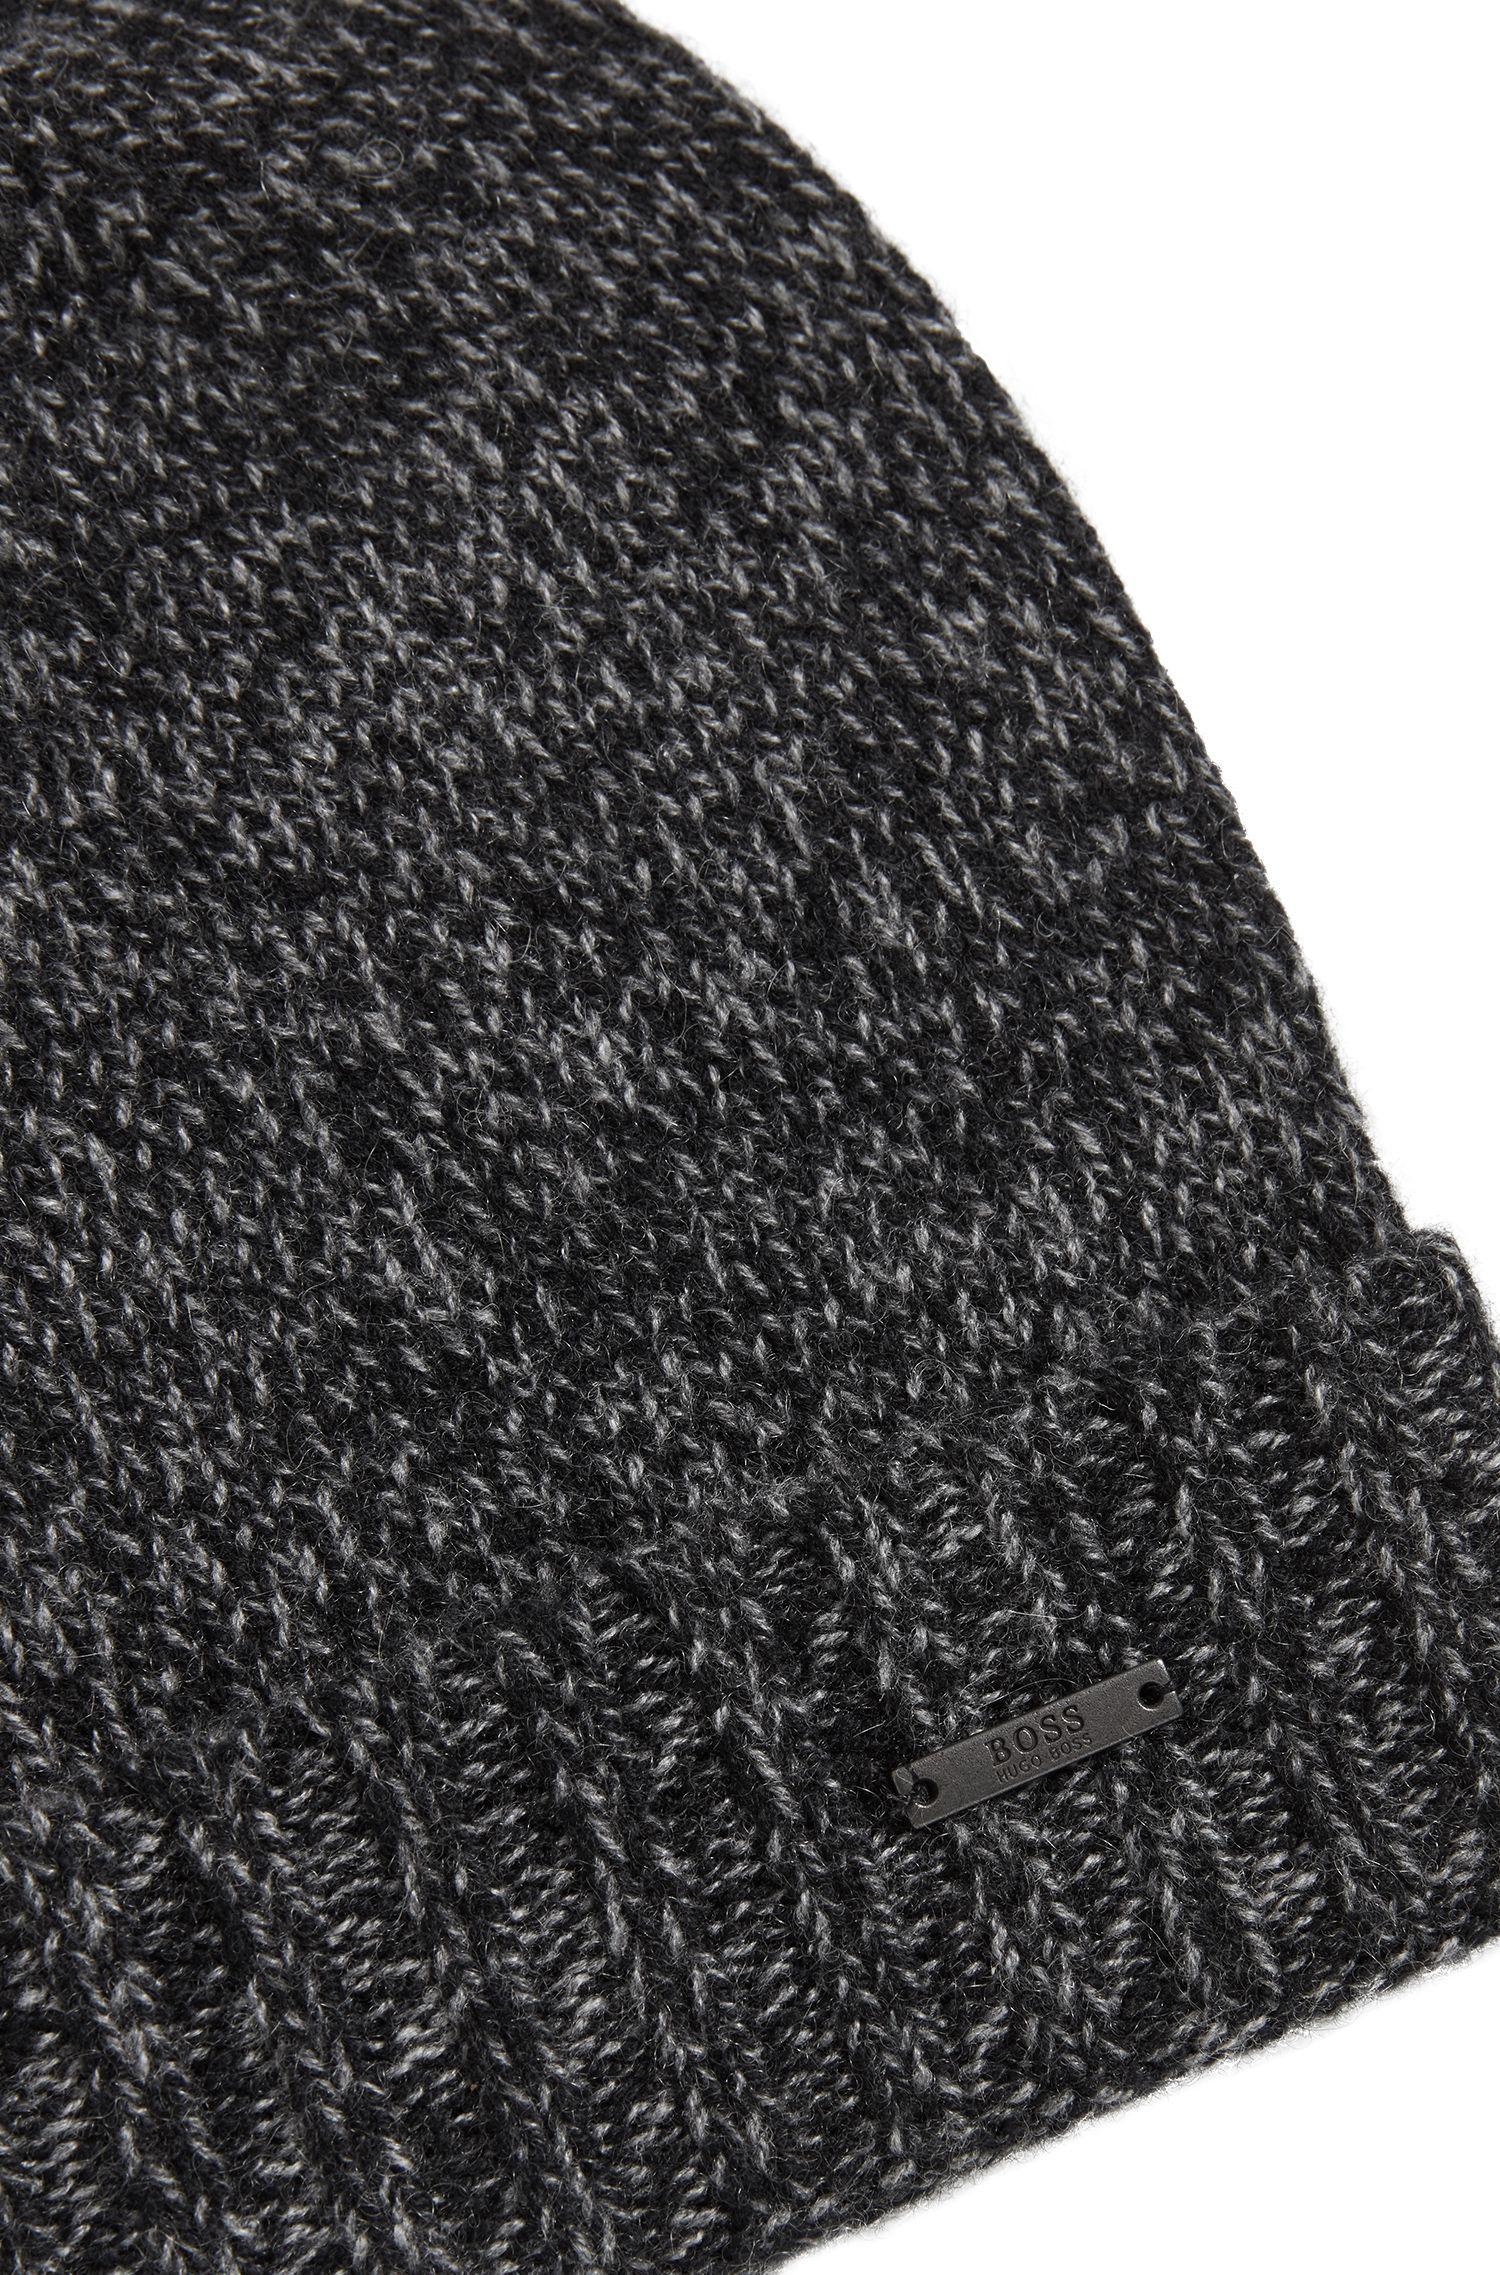 Lyst - BOSS Beanie Hat In Mouliné Cashmere in Black for Men e0e8310e9ab1